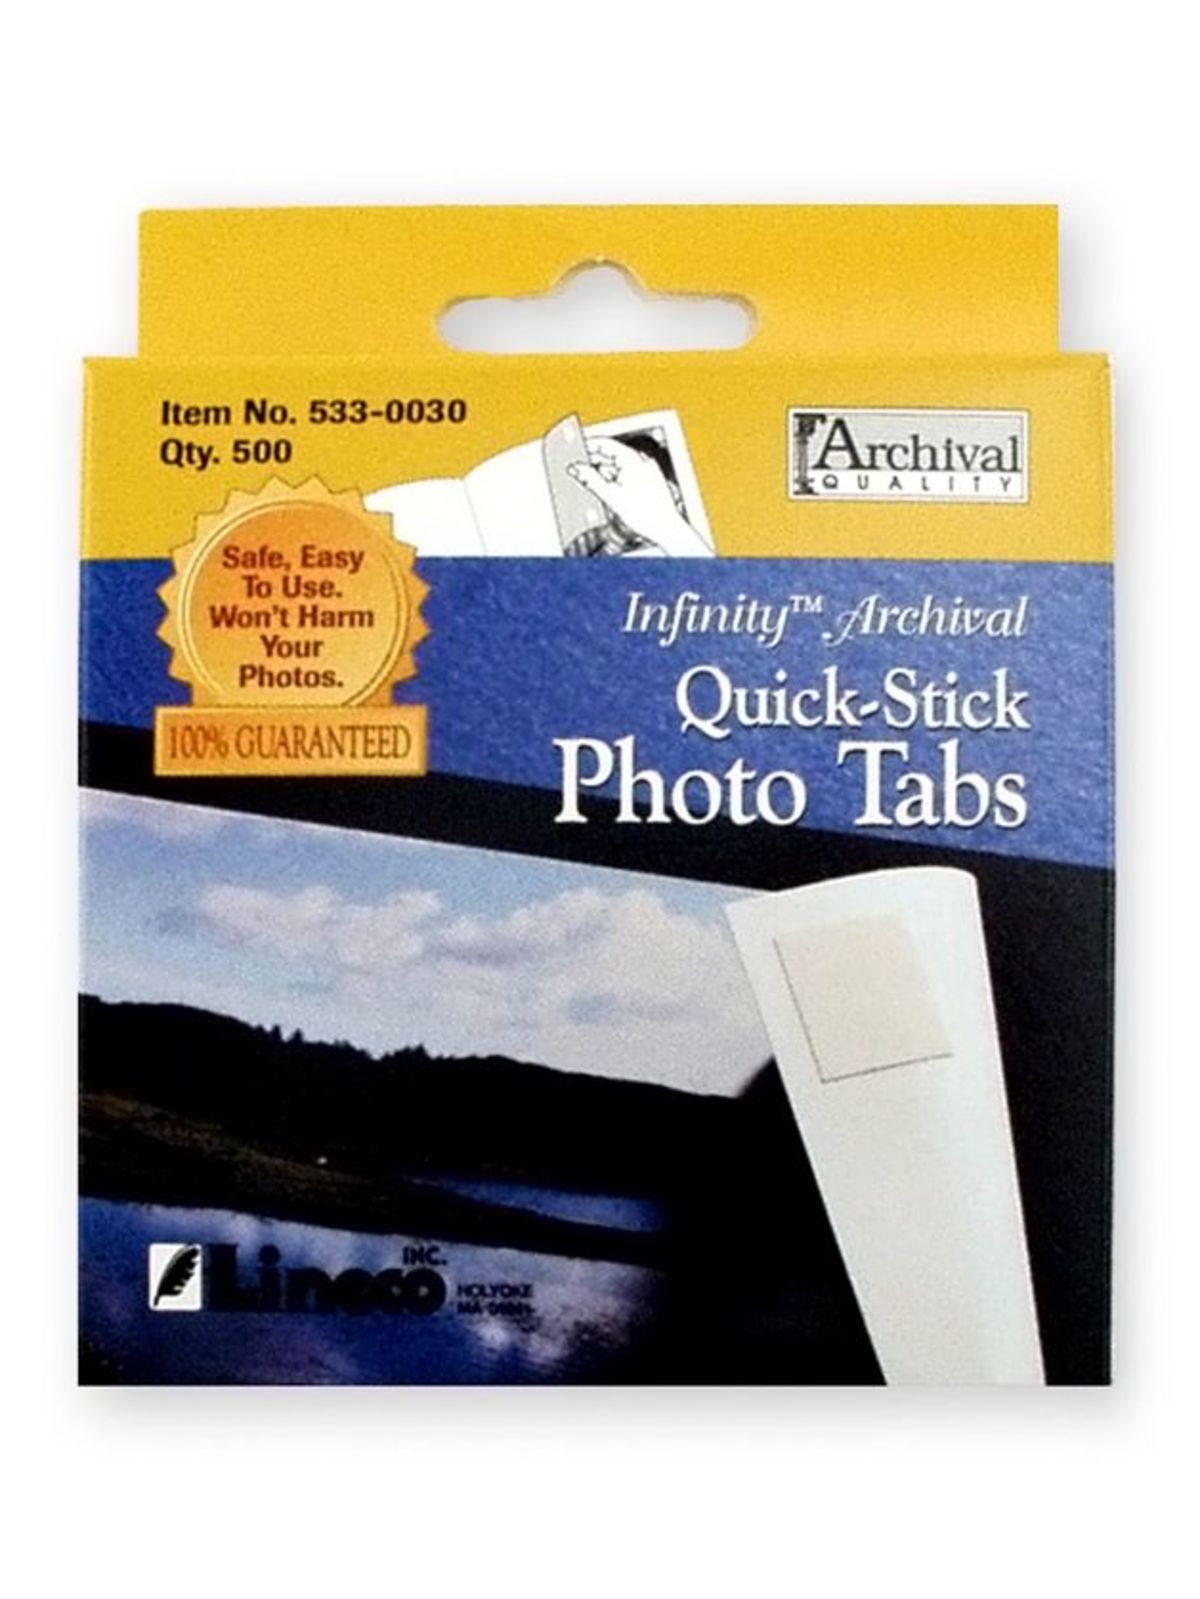 Quick Stick Photo Tabs